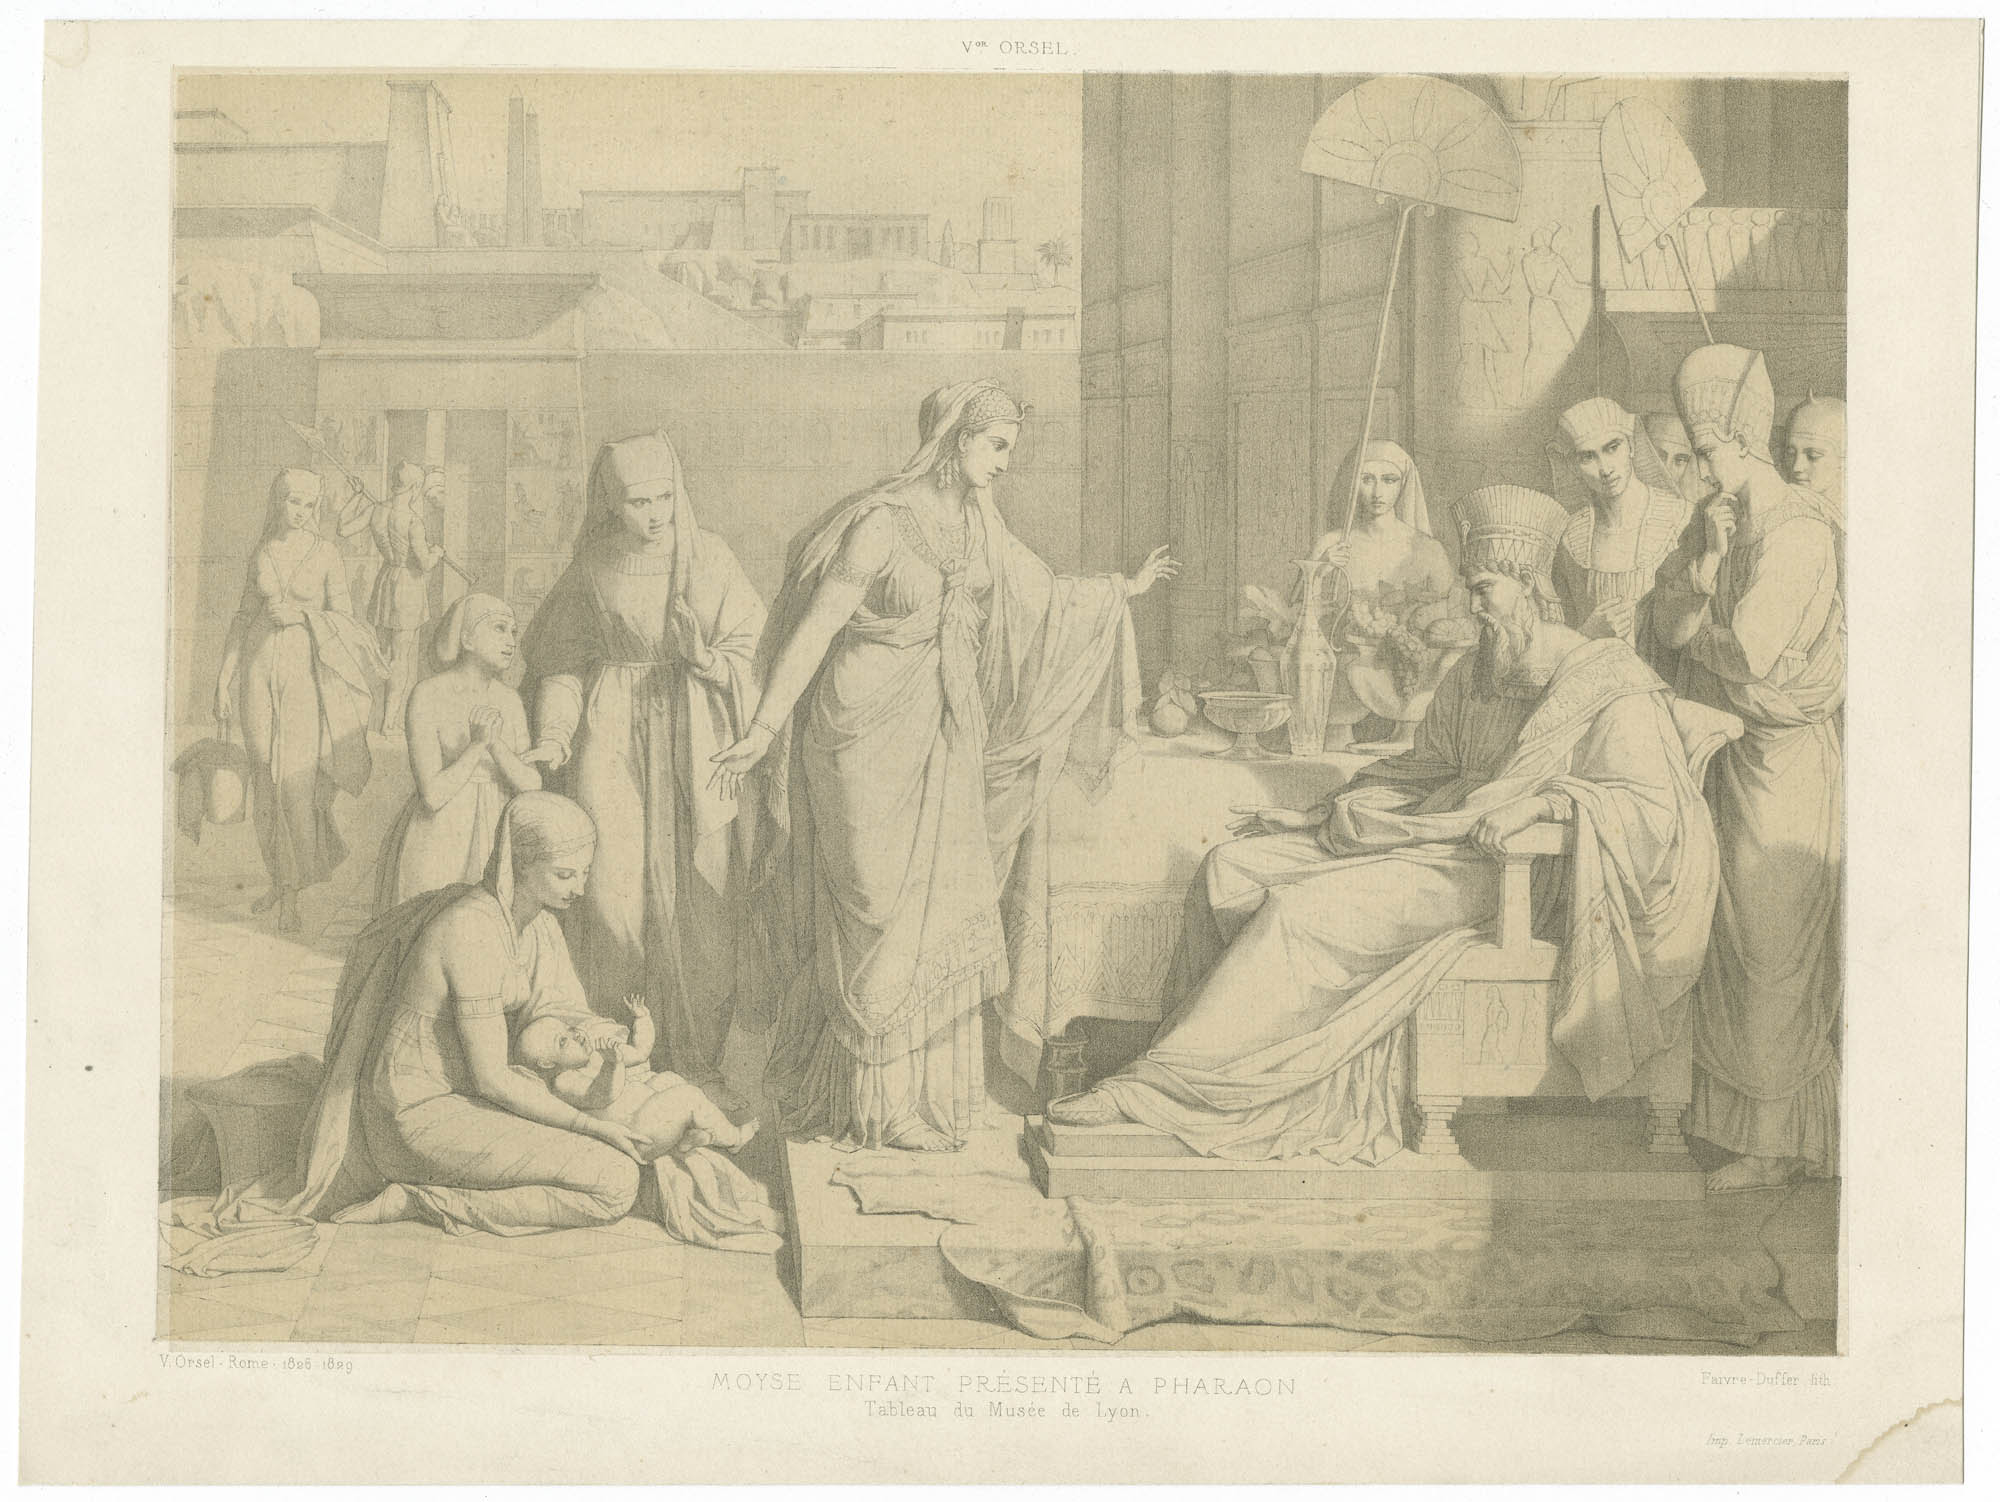 Moyse enfant présenté à Pharaon